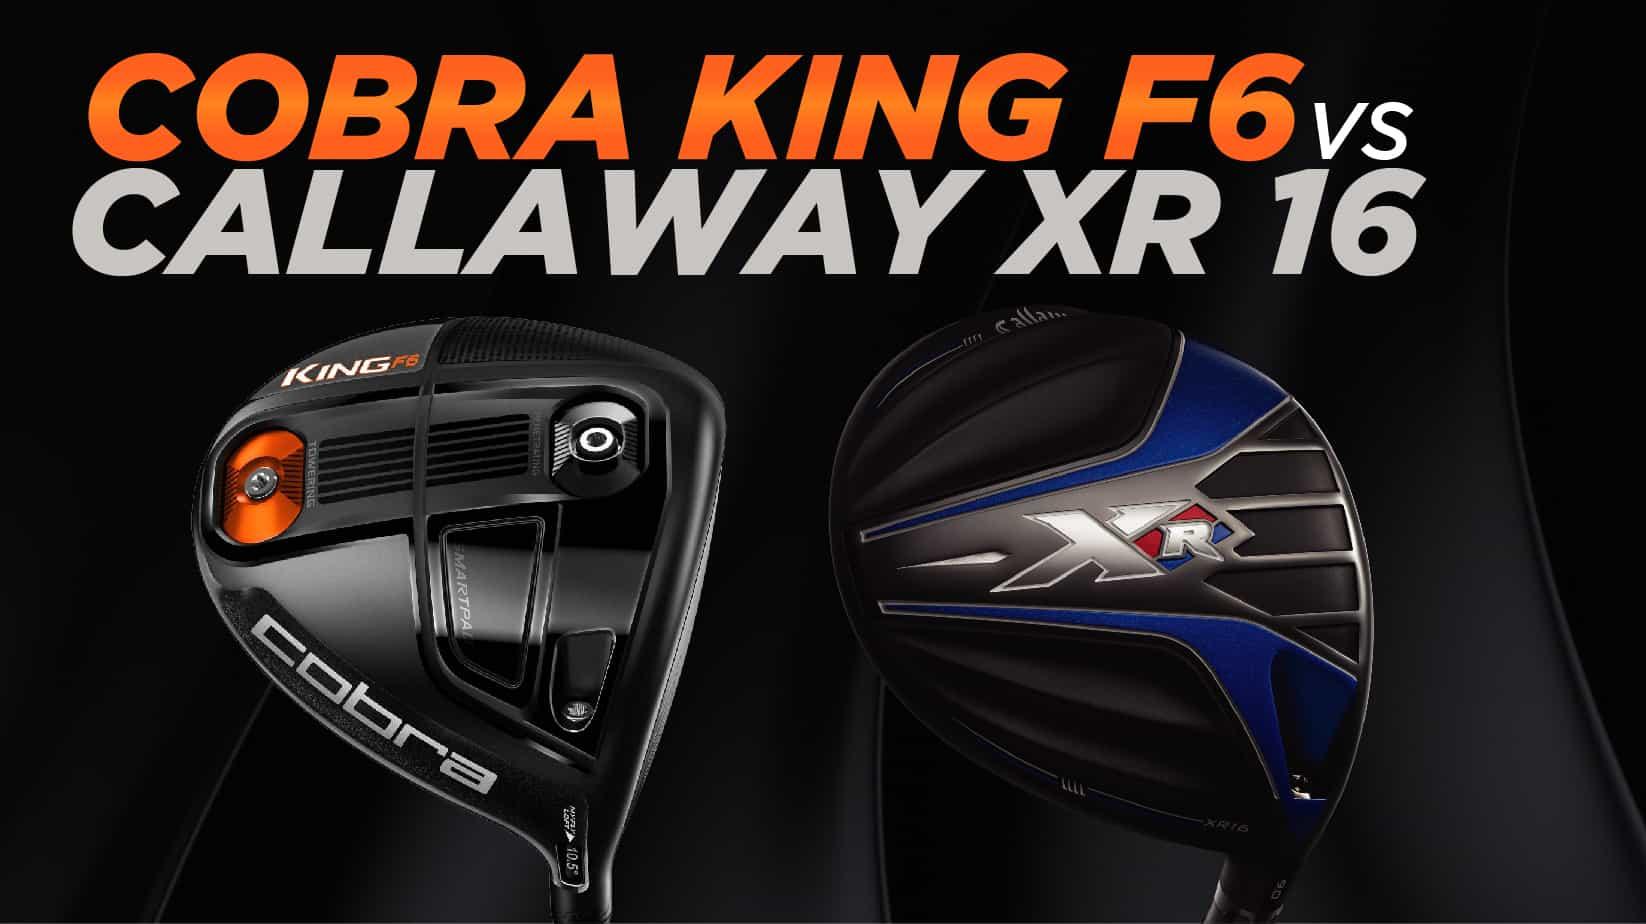 Cobra, Cobra King F6, Callaway XR16